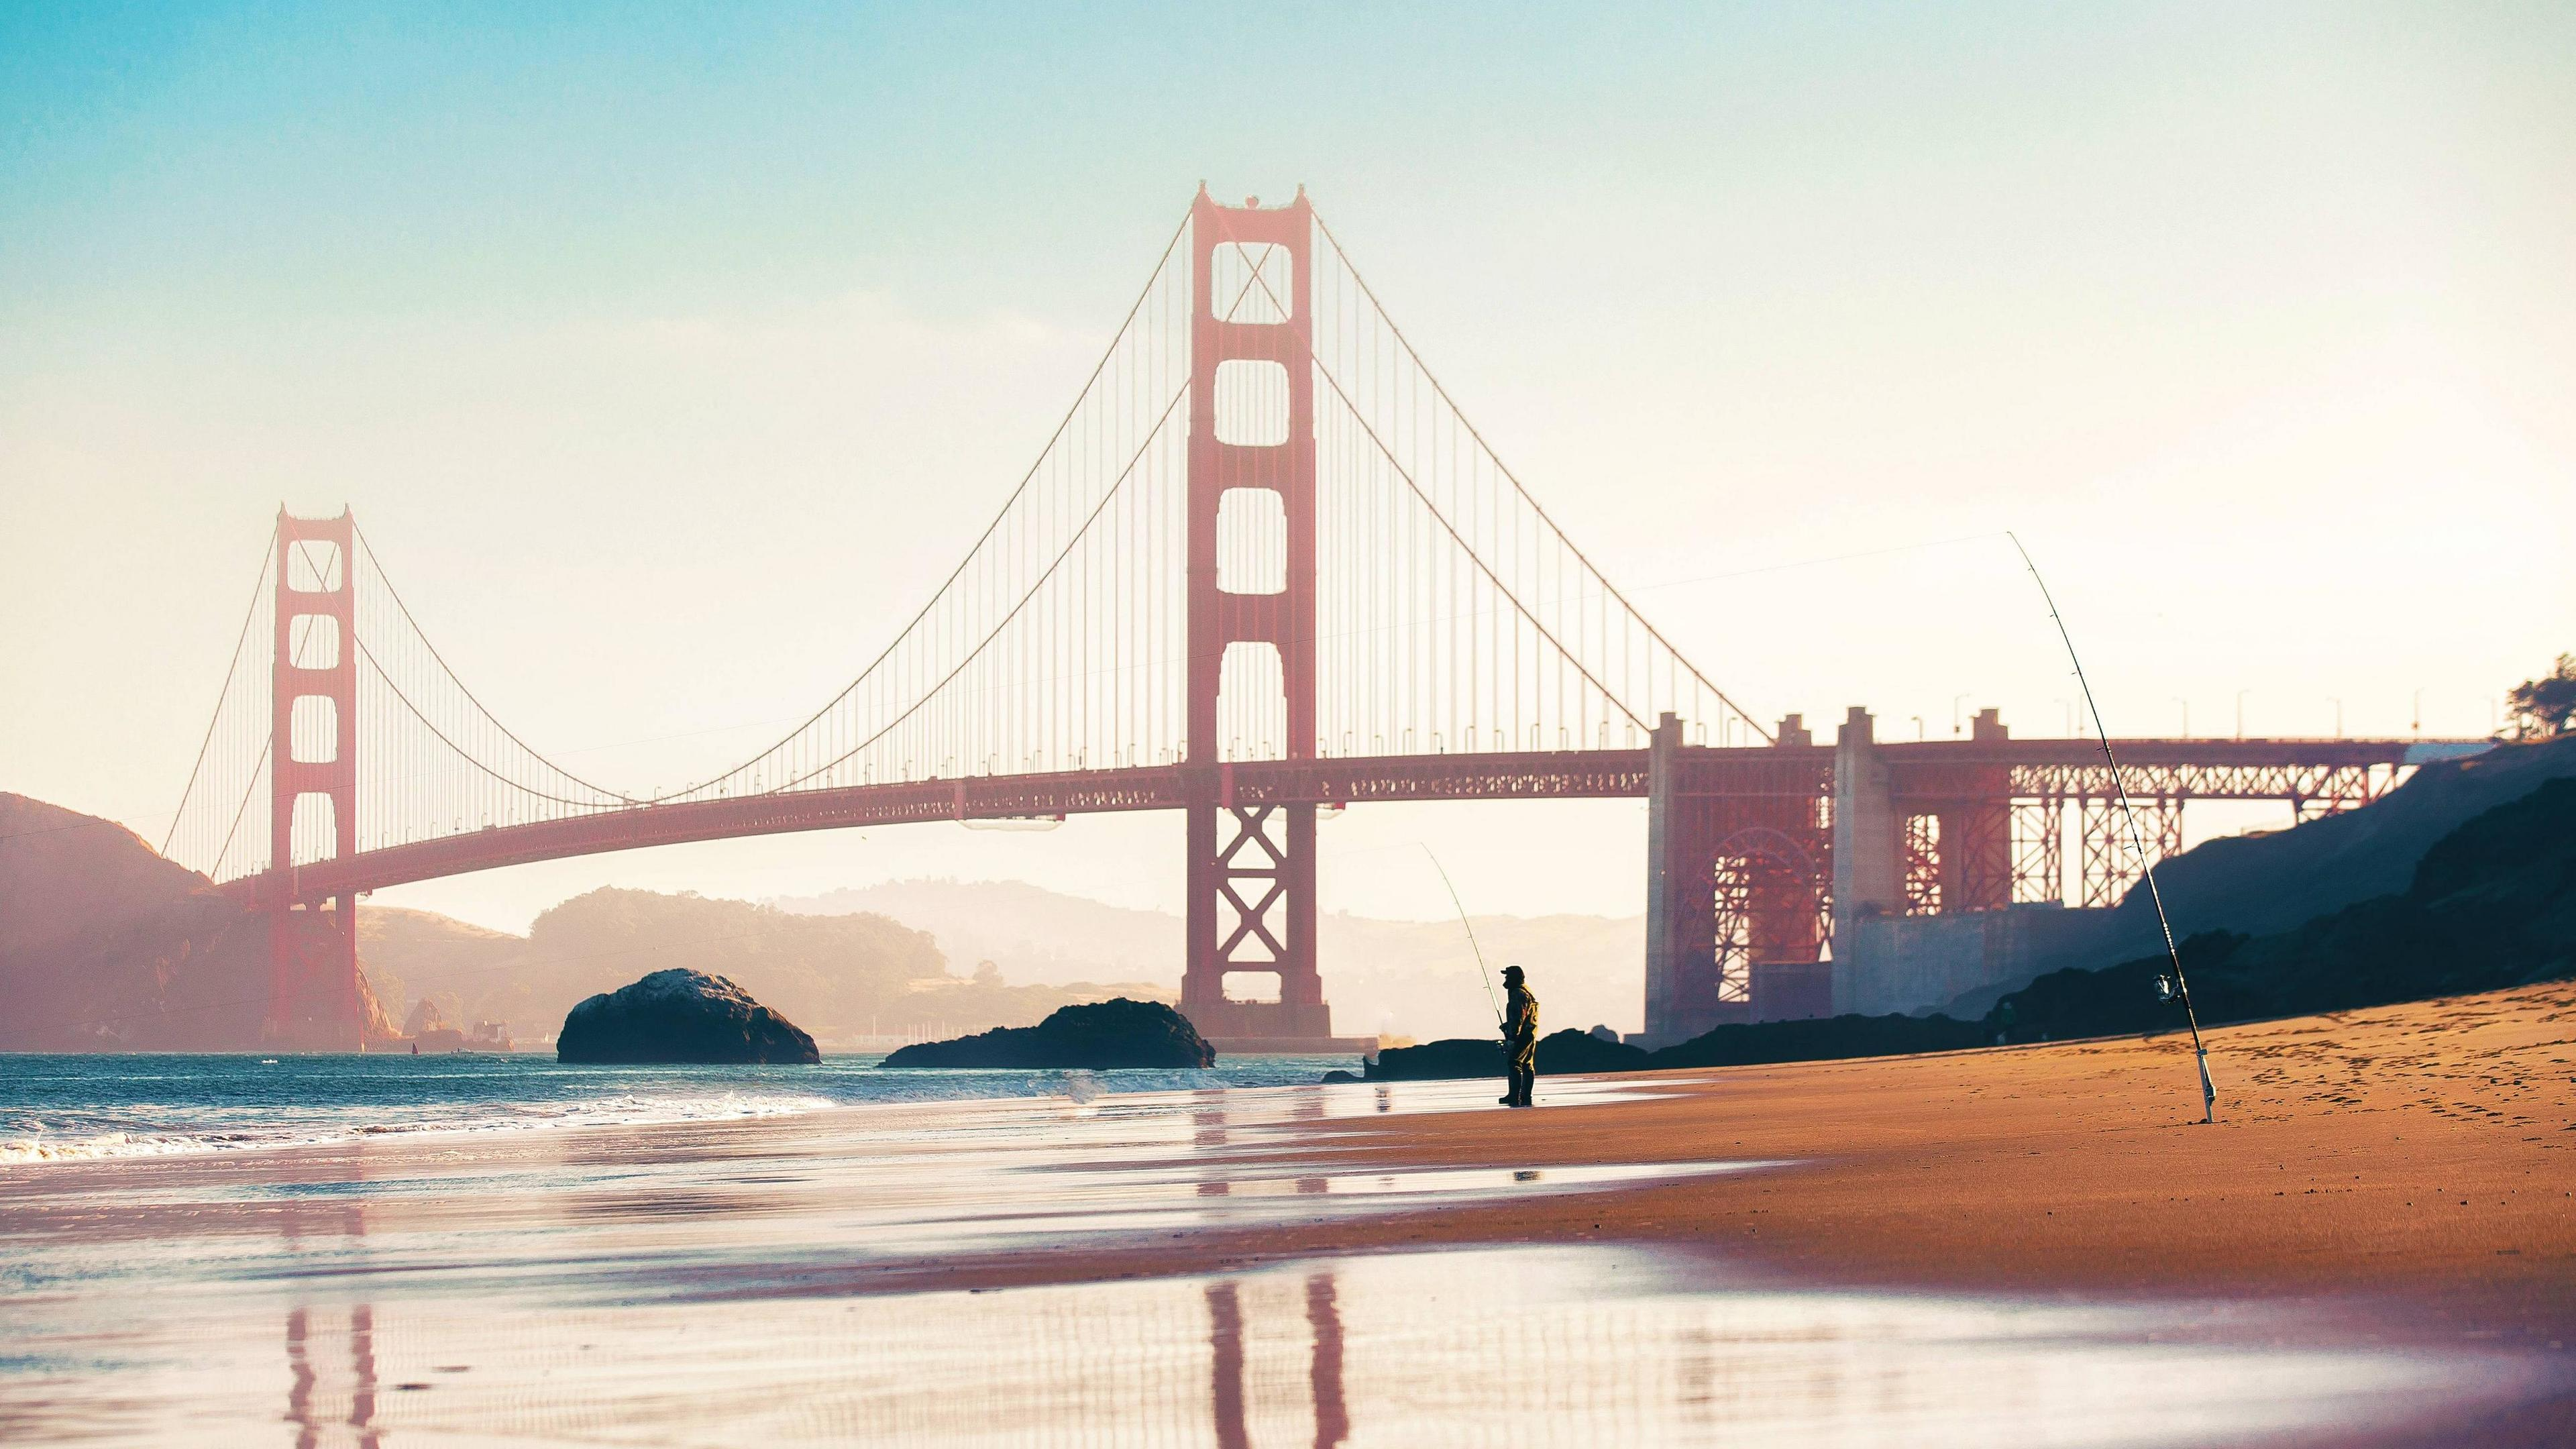 Wallpaper 4k Golden Gate Bridge San Francisco 4k 4k Wallpapers Bridge Wallpapers Golden Gate Bridge Wallpapers Hd Wallpapers San Francisco Wallpapers World Wallpapers